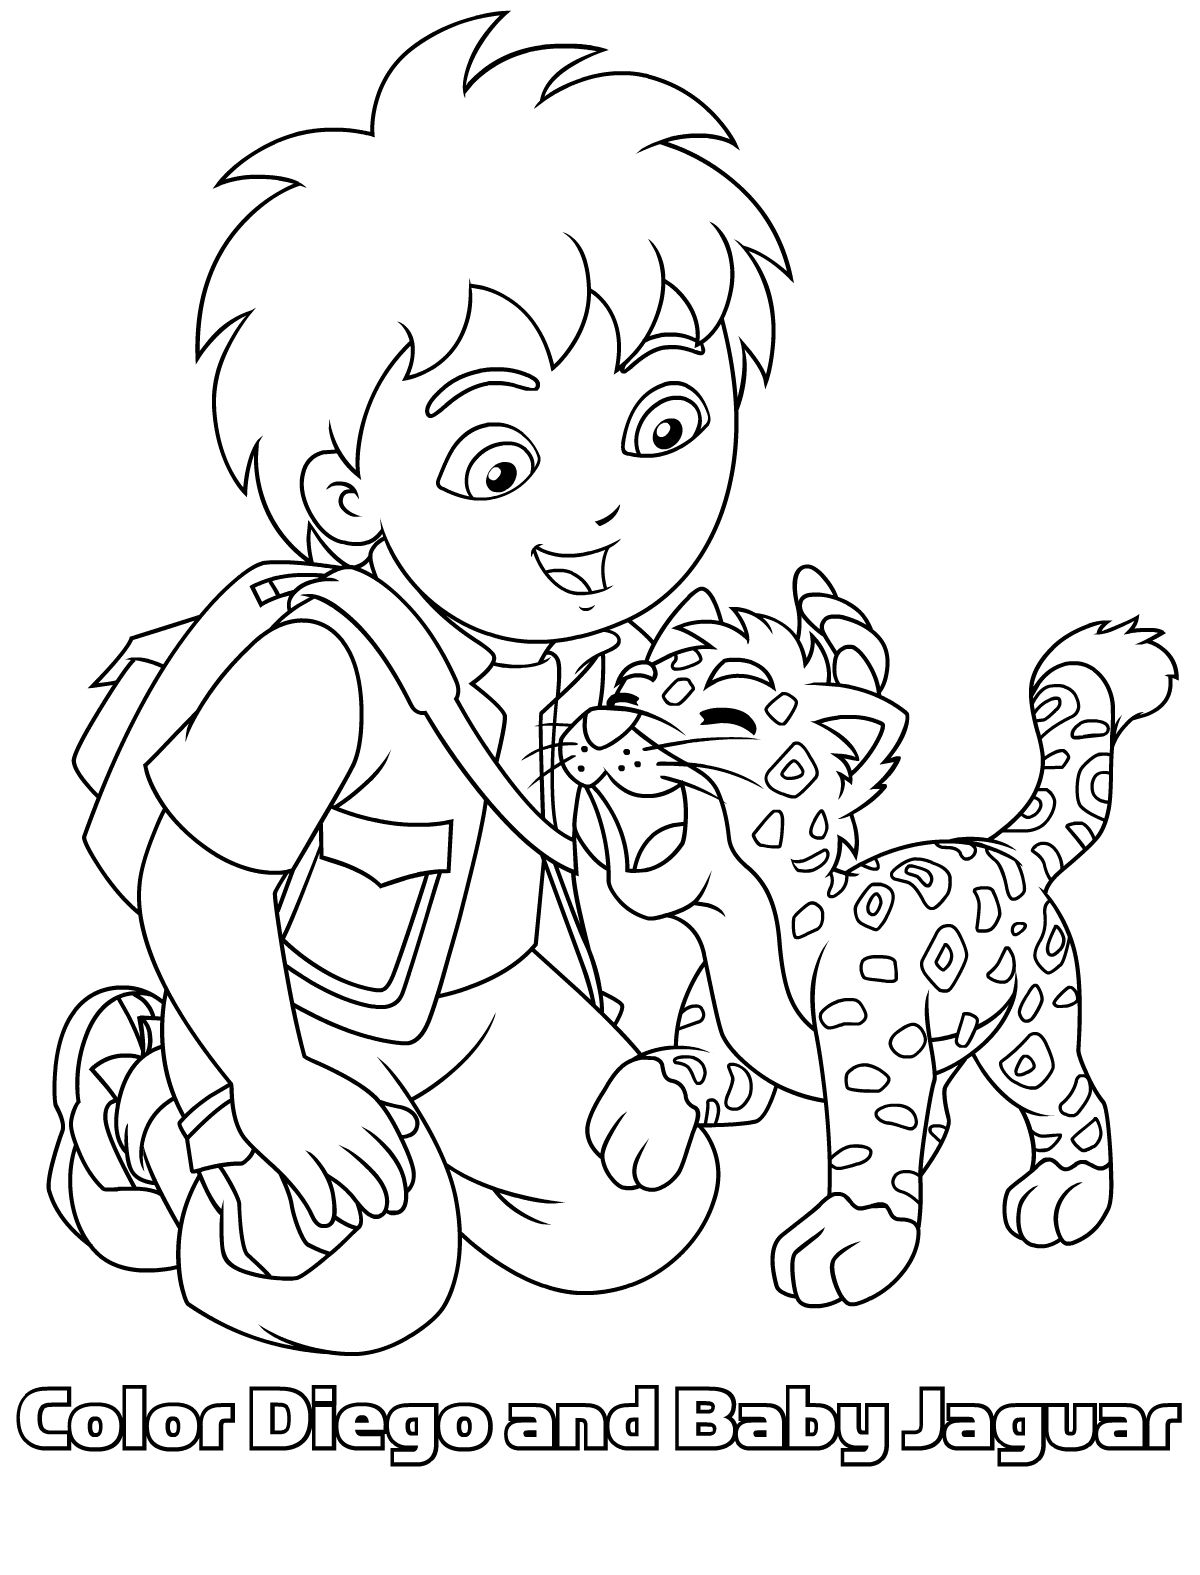 Diego En Baby Jaguar Samen Op 1 Kleurplaat Clip Art Cute